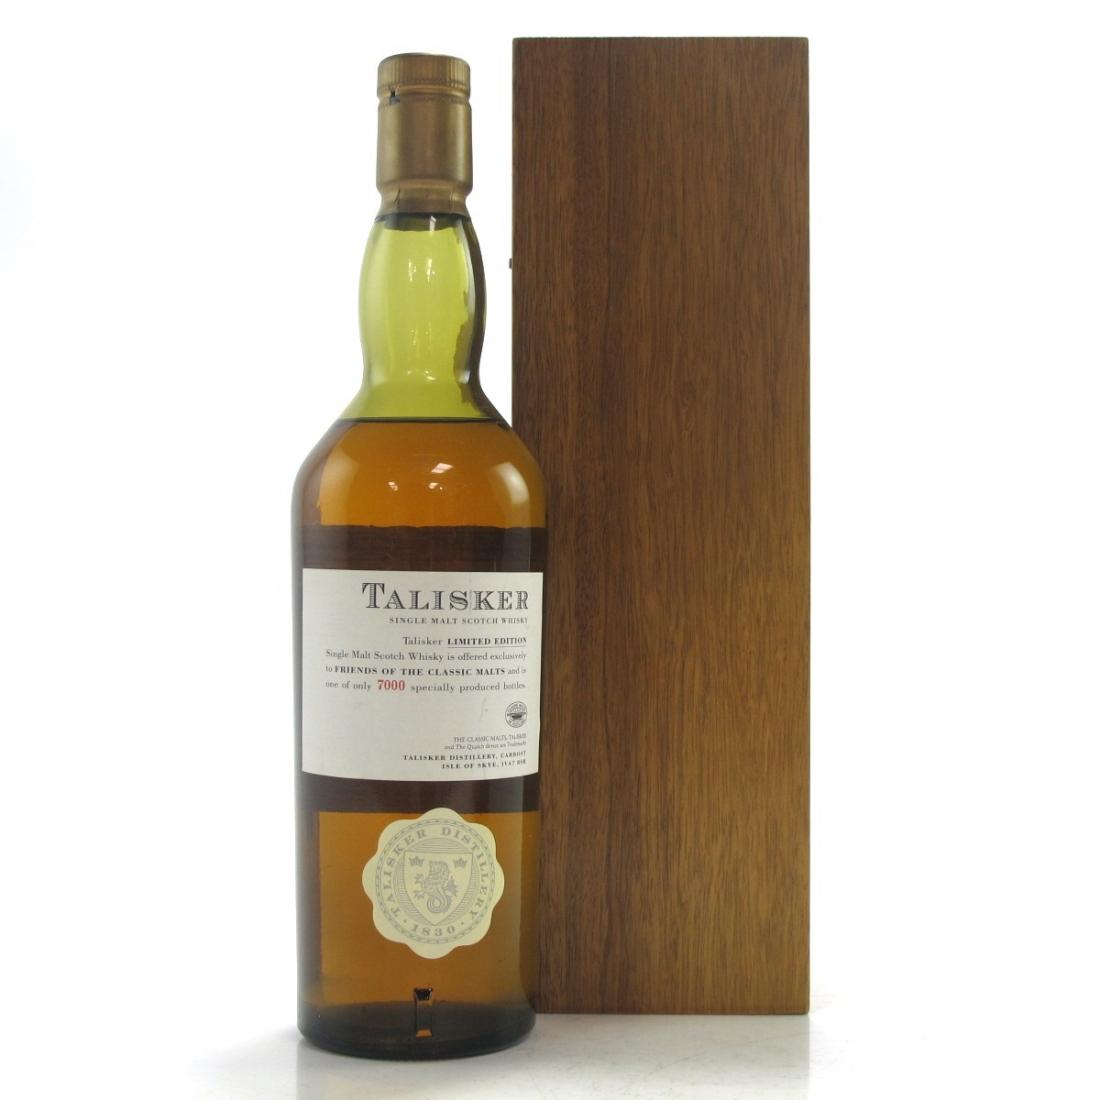 Talisker 1989 Friends of The Classic Malts